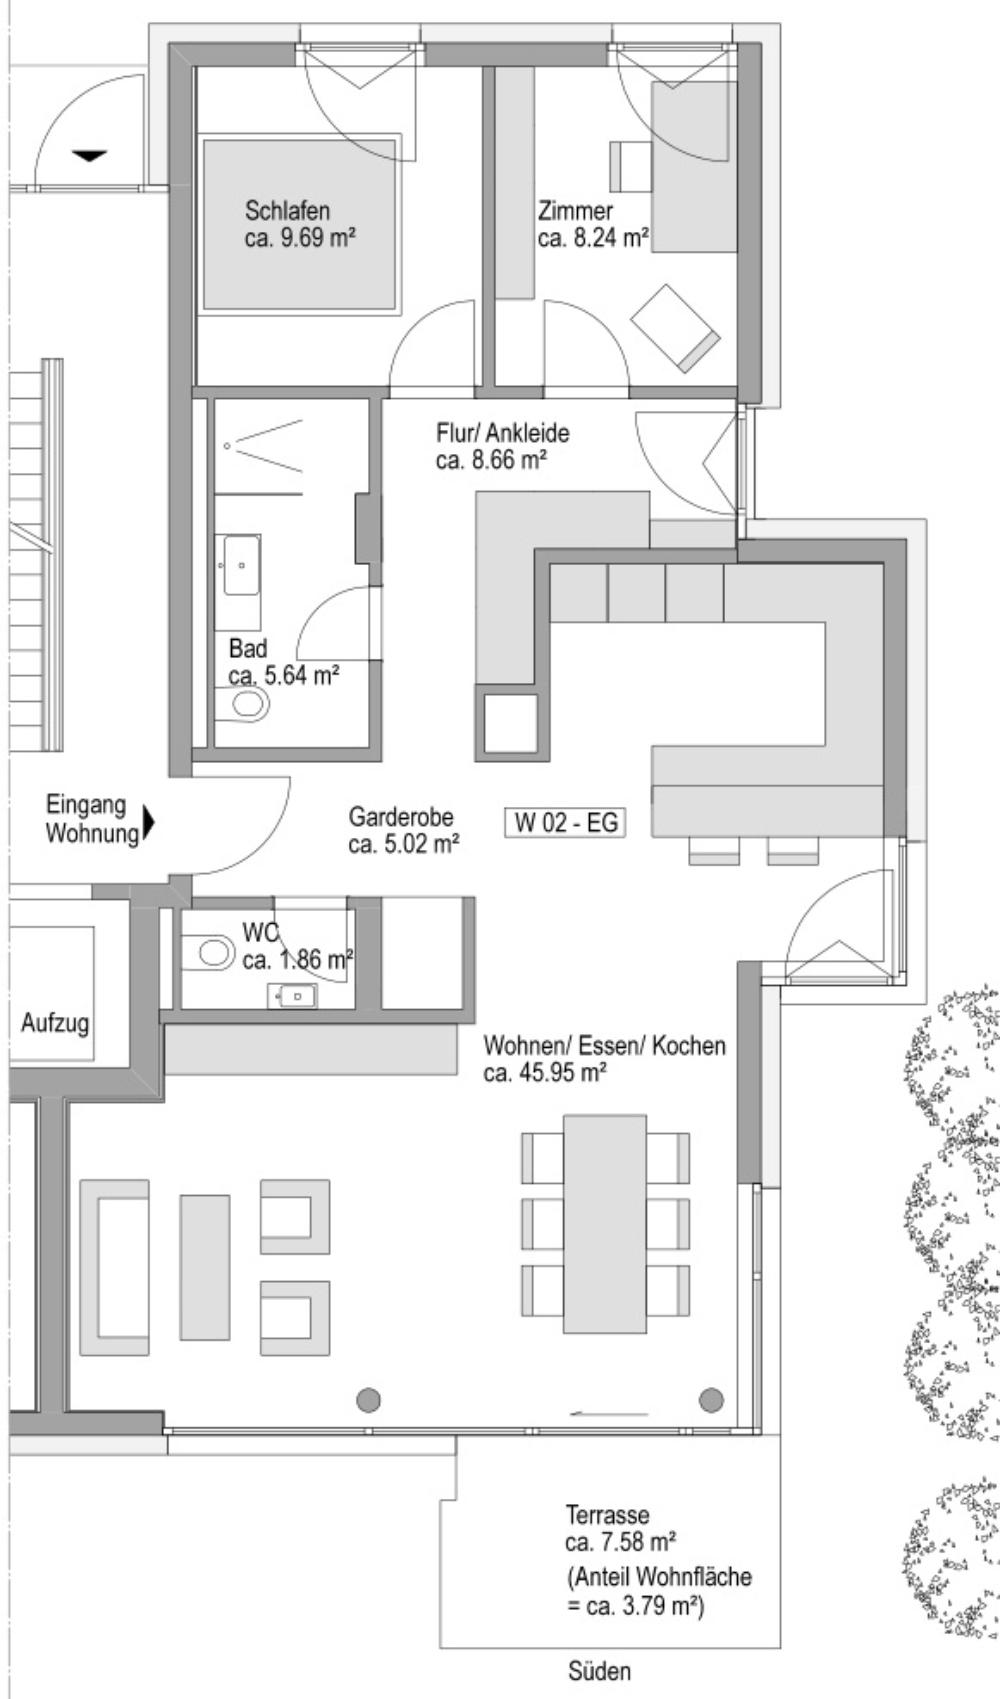 Grundriss Haus 12 W02